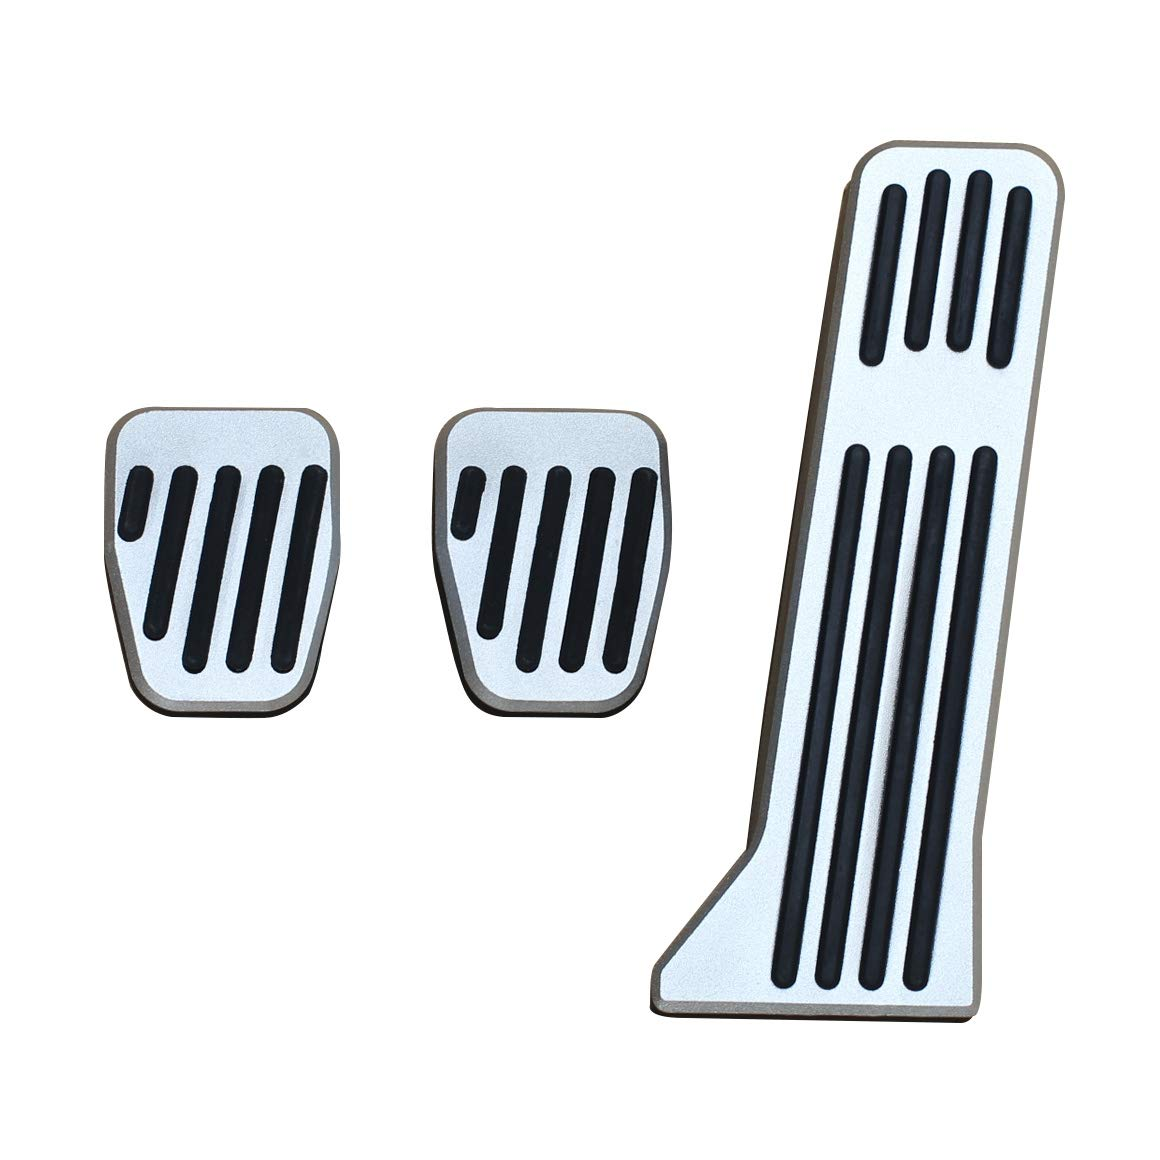 No Drill Brake Accelerator Gas Clutch Foot Pedal Covers For Mazda 2 3 6 CX3 CX5